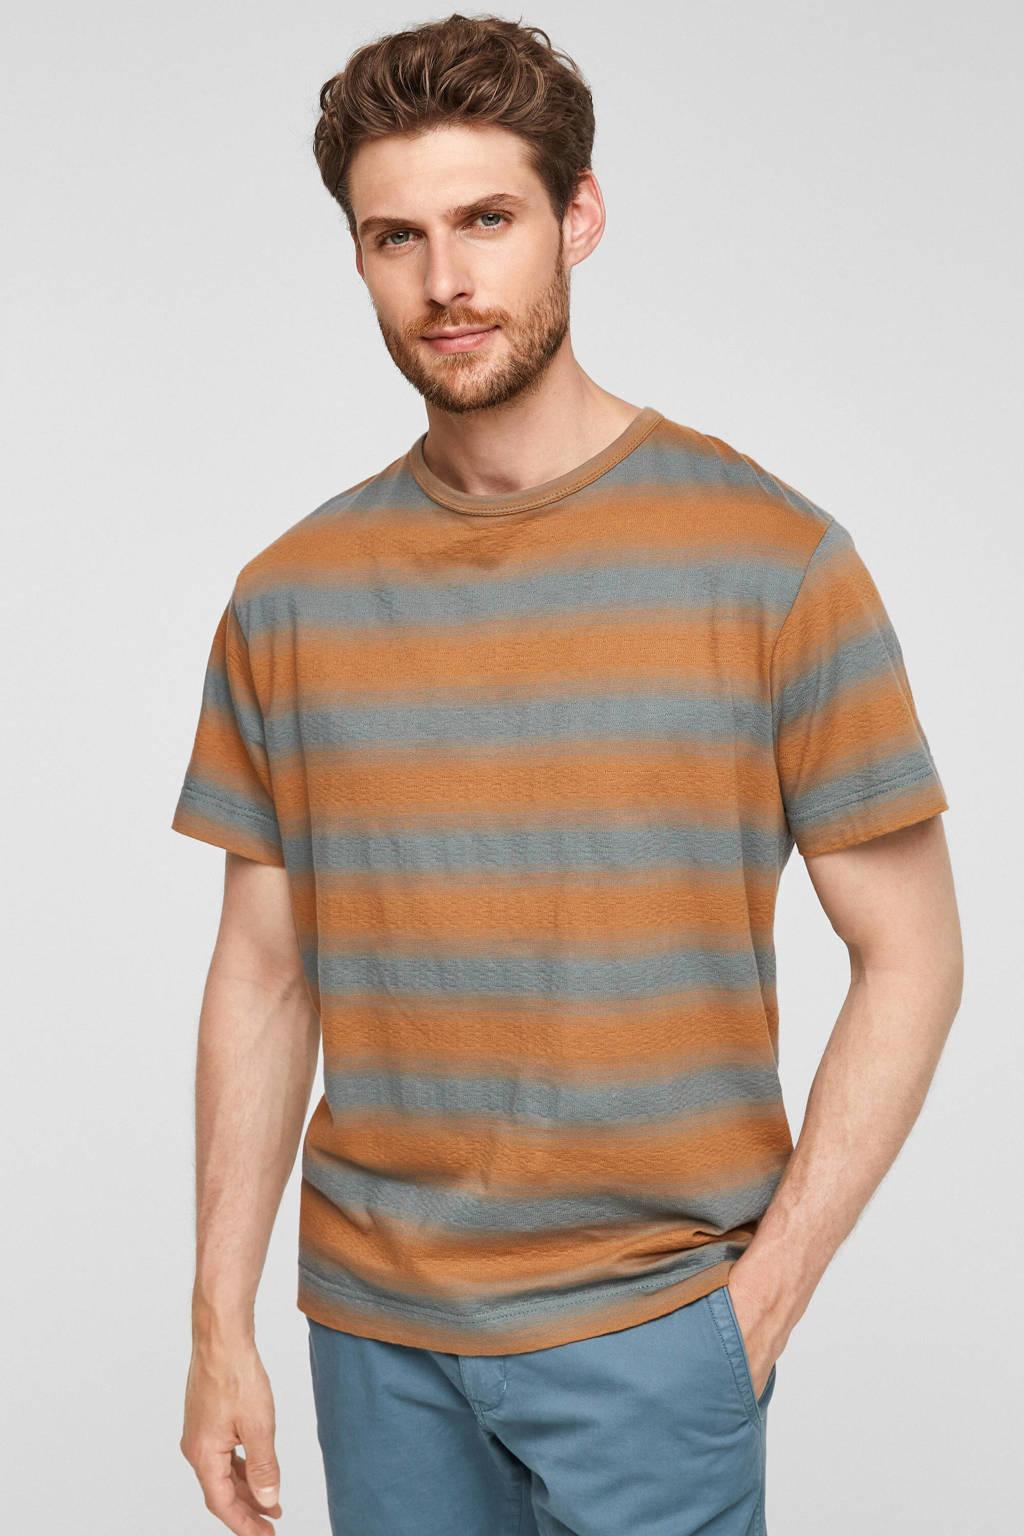 s.Oliver gestreept regular fit T-shirt petrol/oranje, Petrol/oranje